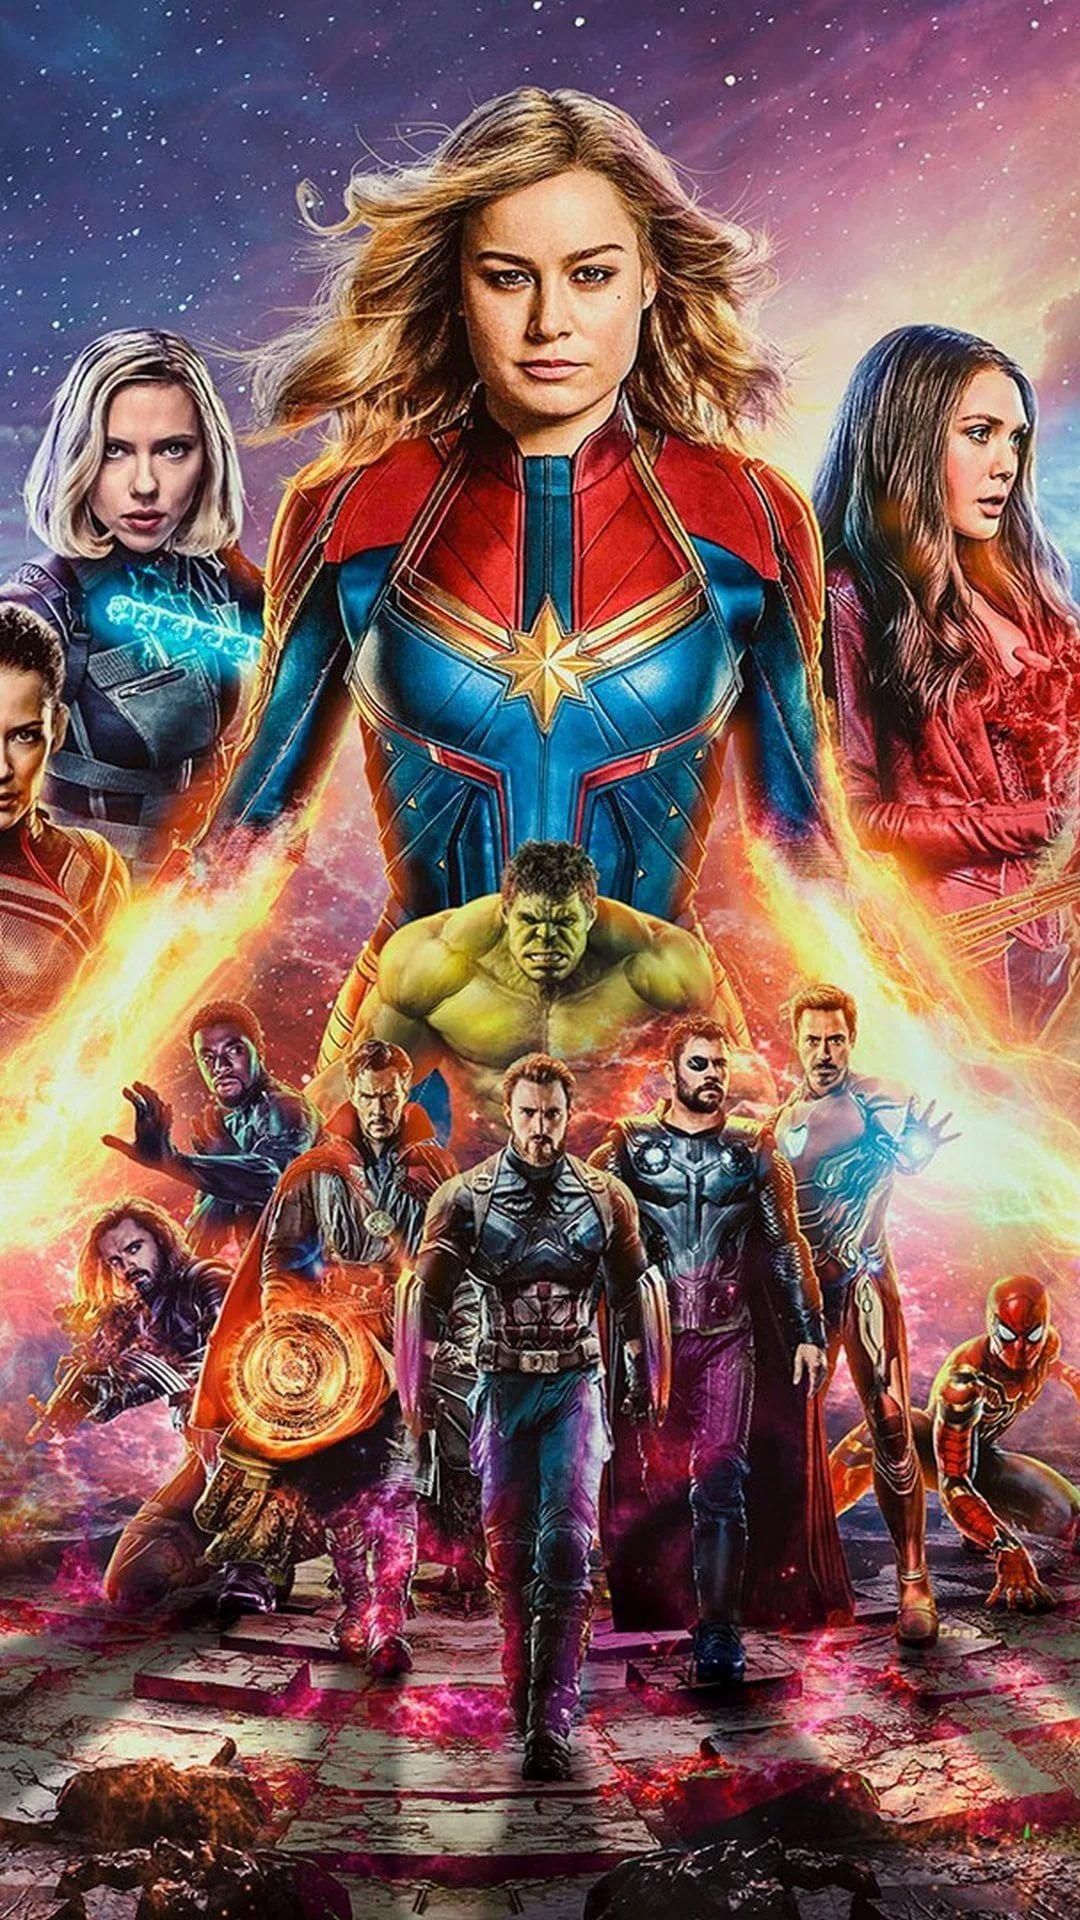 The Avengers iPhone hd wallpaper